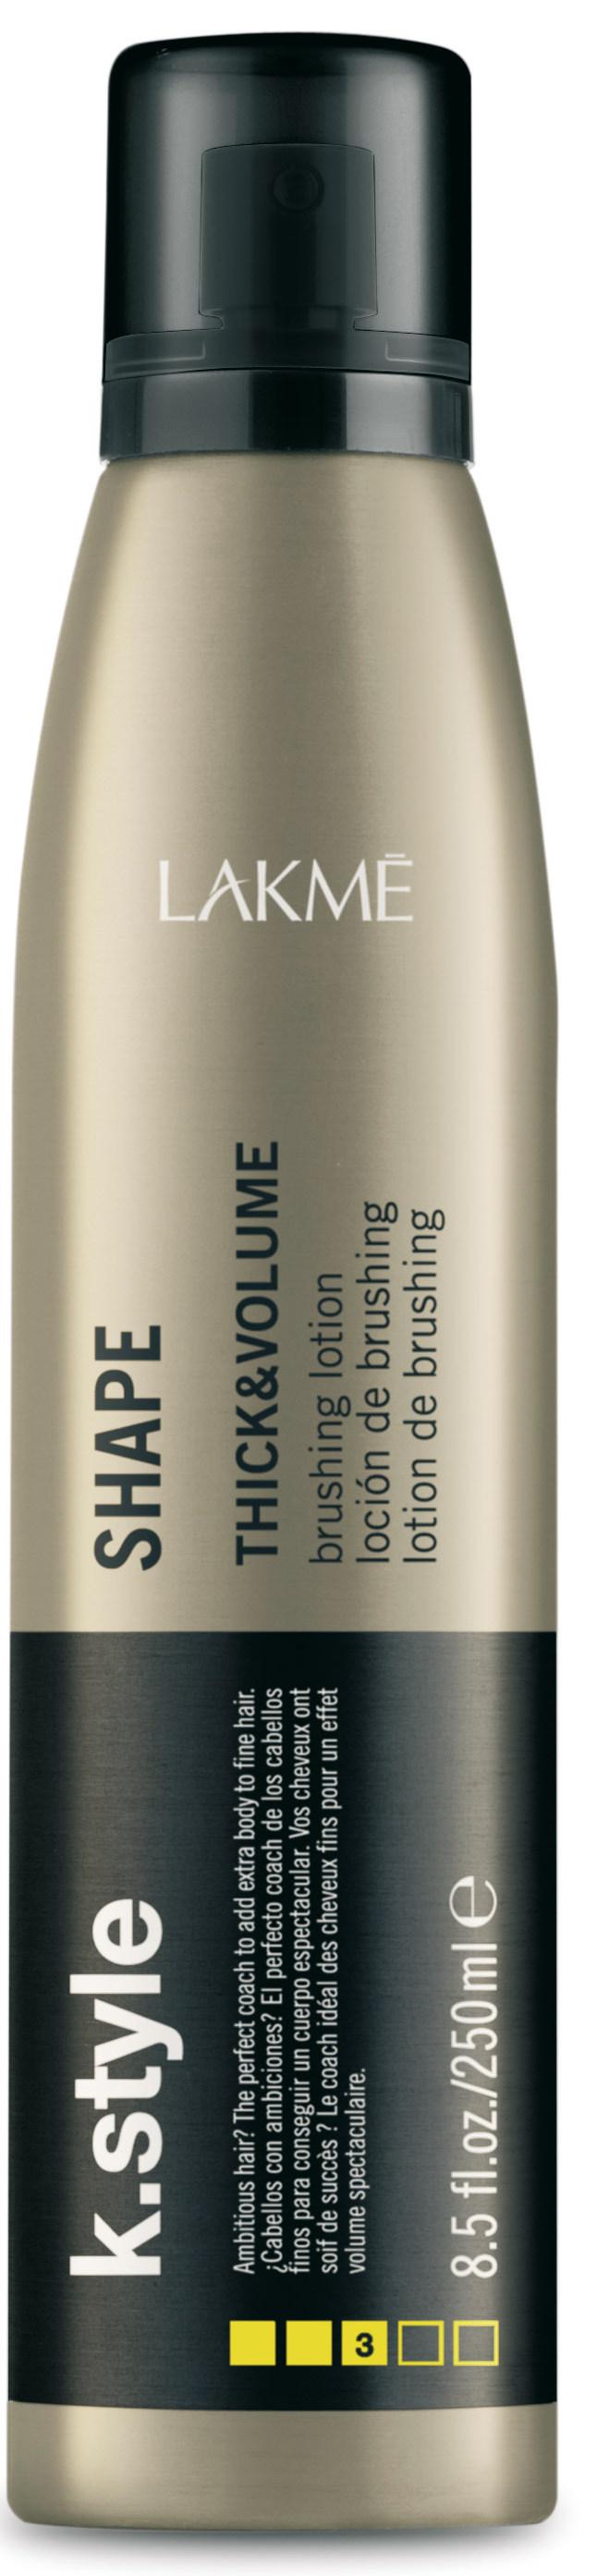 Купить LAKME Лосьон для укладки волос, придающий объем / SHAPE 250 мл